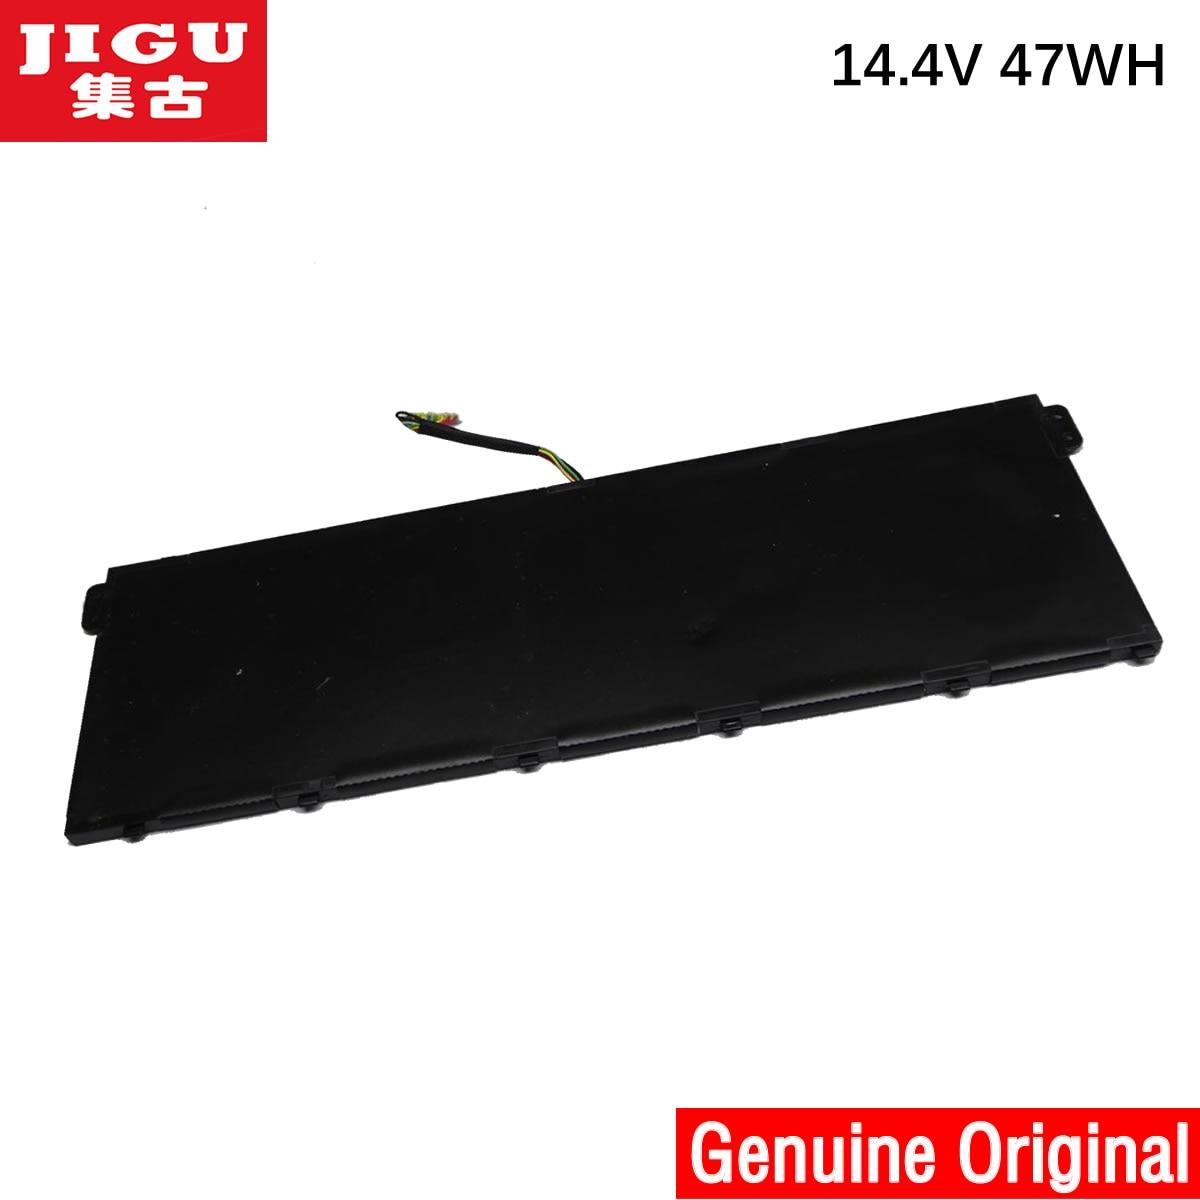 цены  JIGU original laptop Battery AC14B3K FOR ACER R5-571T R5-571TG FOR Aspire S14 CB3-511 Swift 3 3S F314-51